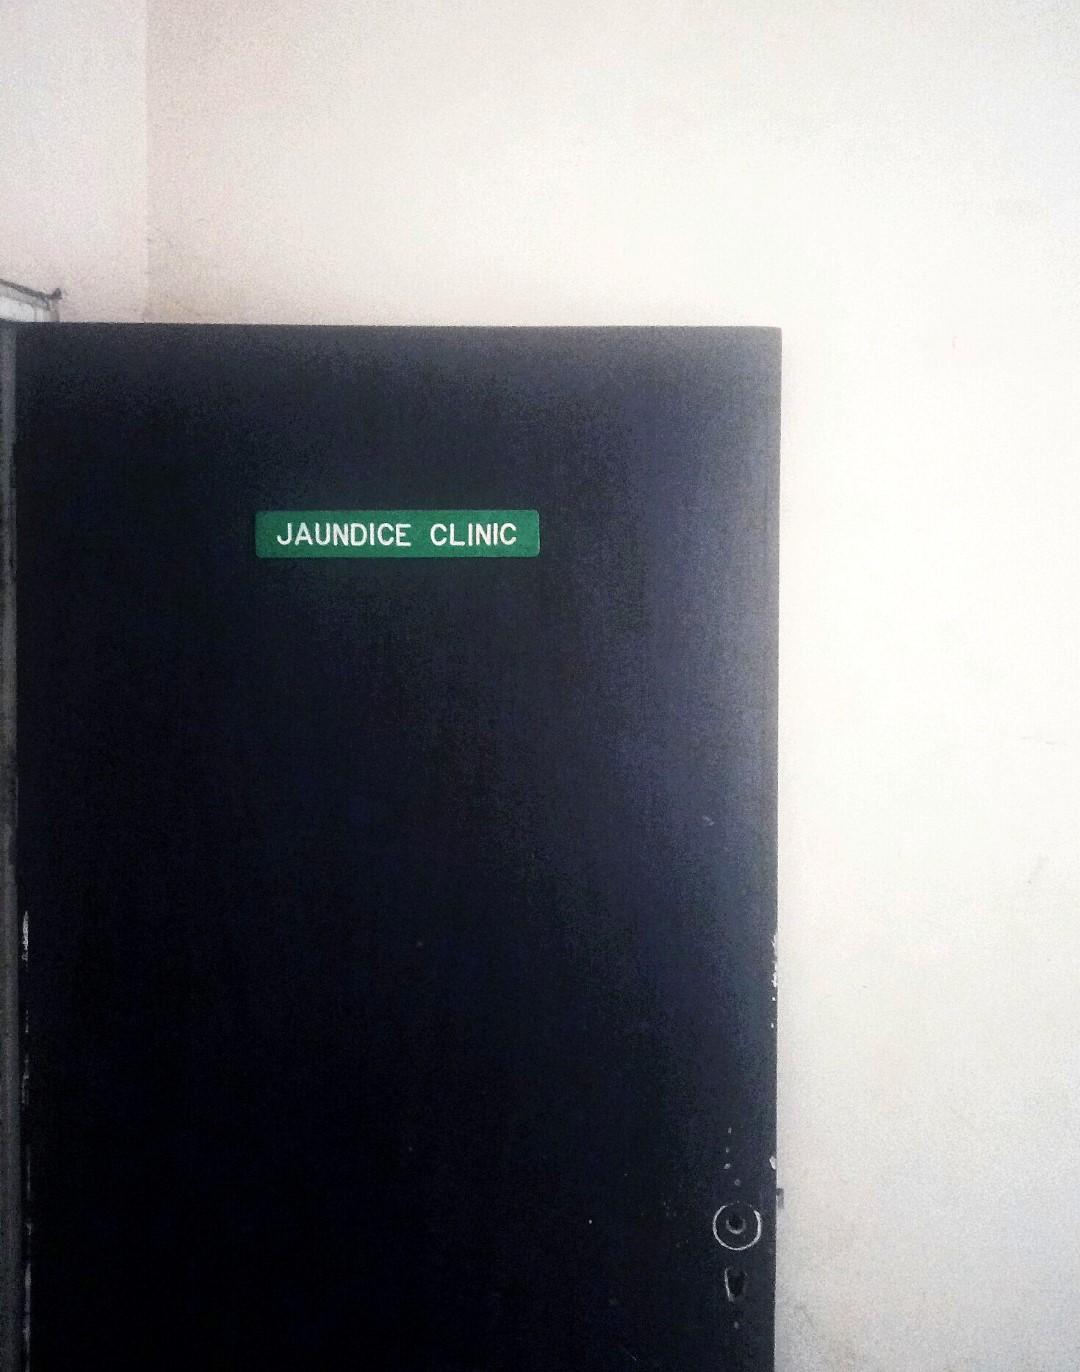 Jaundice clinic luth